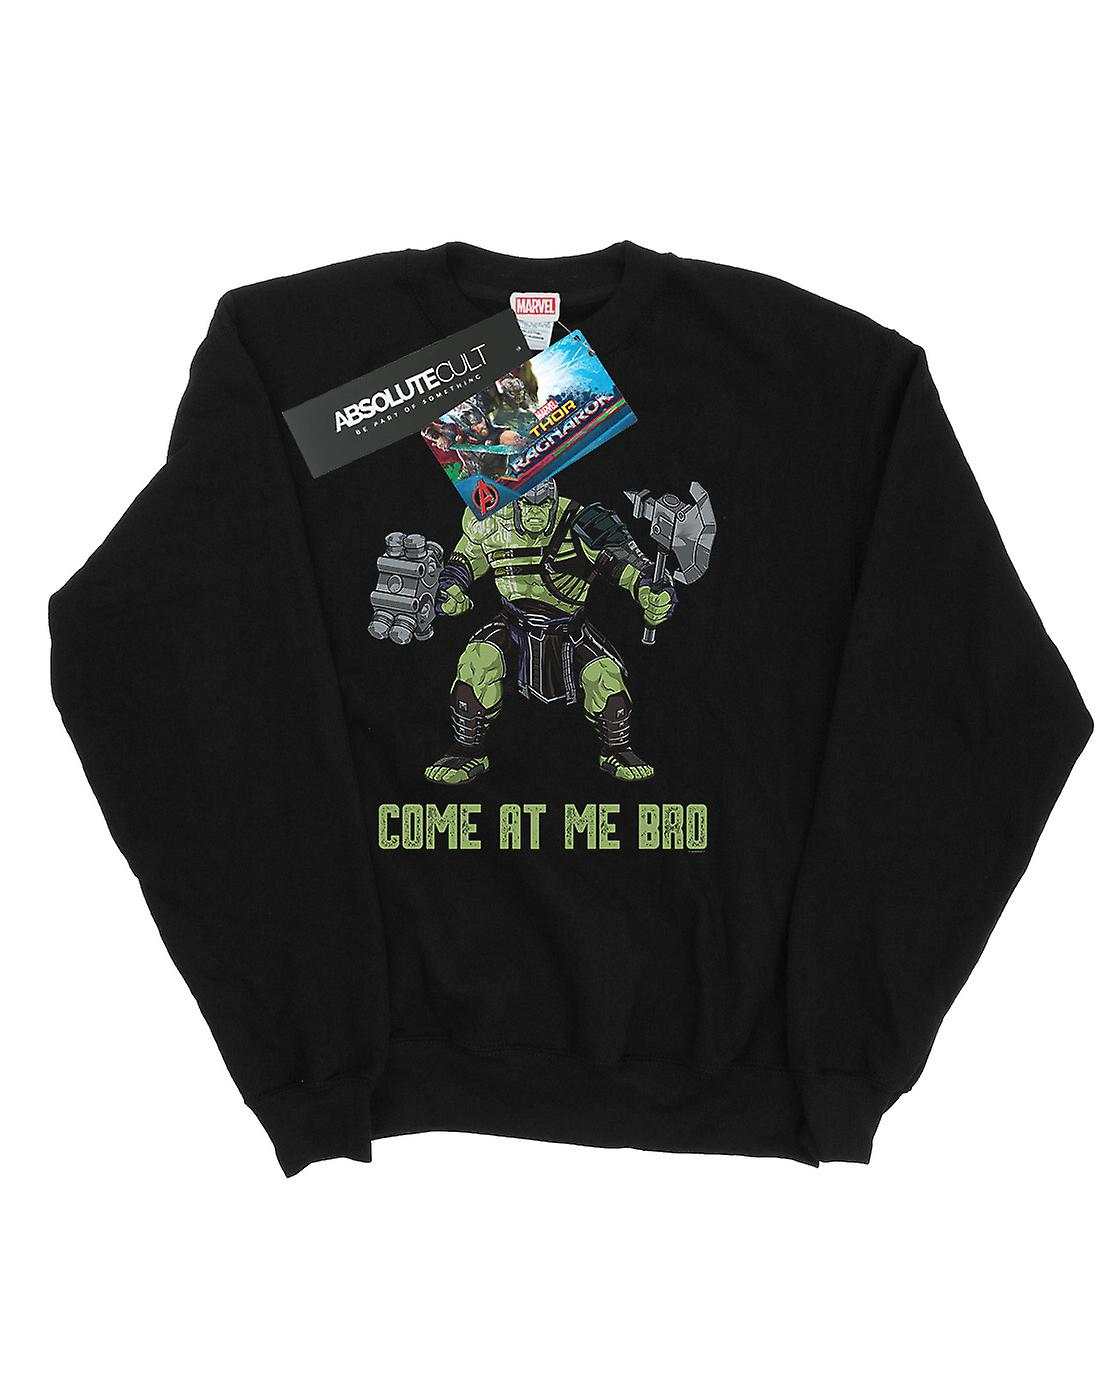 Marvel Women's Thor Ragnarok Come At Me Bro Sweatshirt